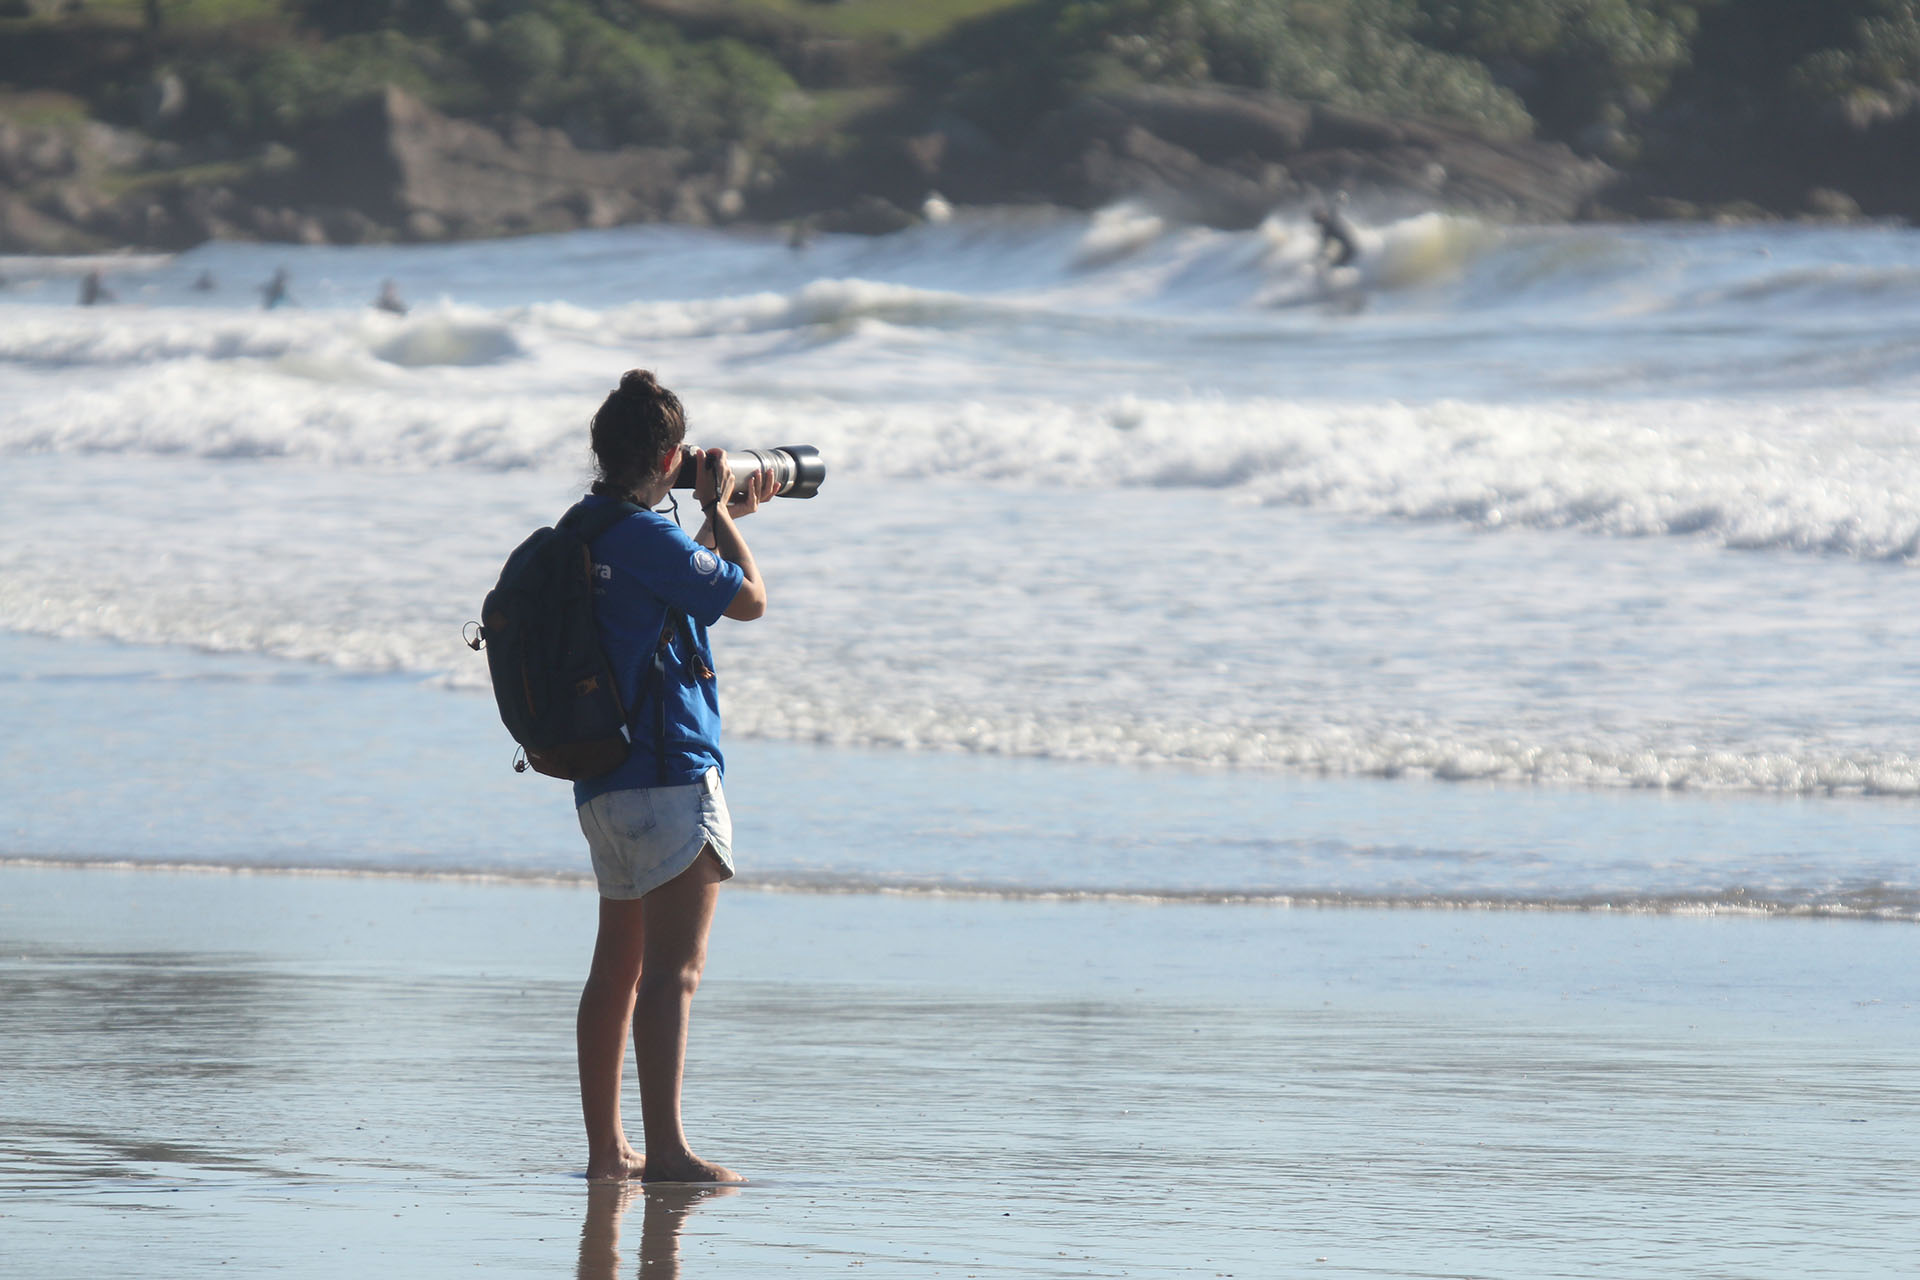 fotografia de surf